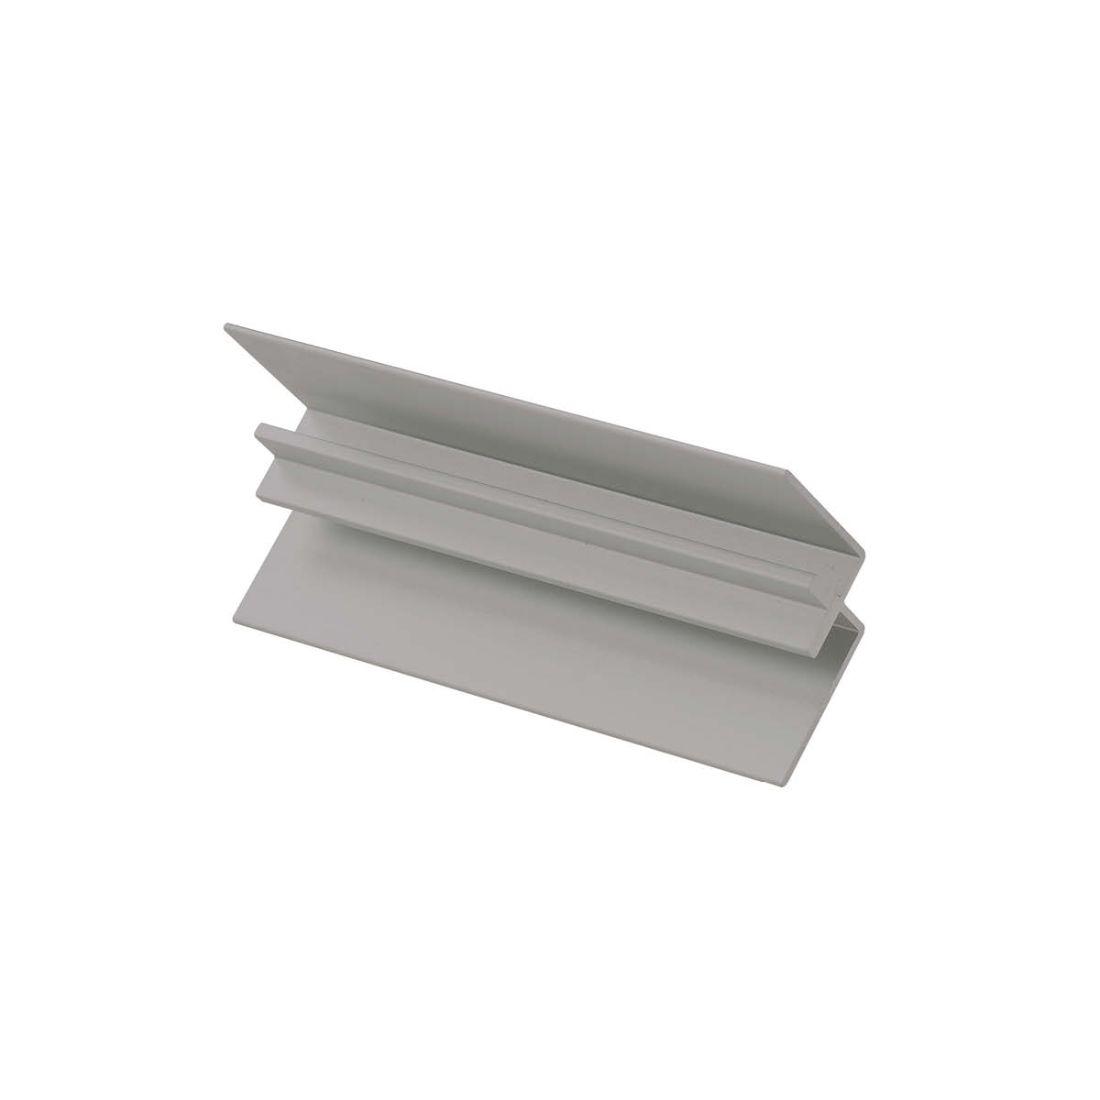 Aluminium Internal Corner Jointer Concrete 2700 x 4.5mm